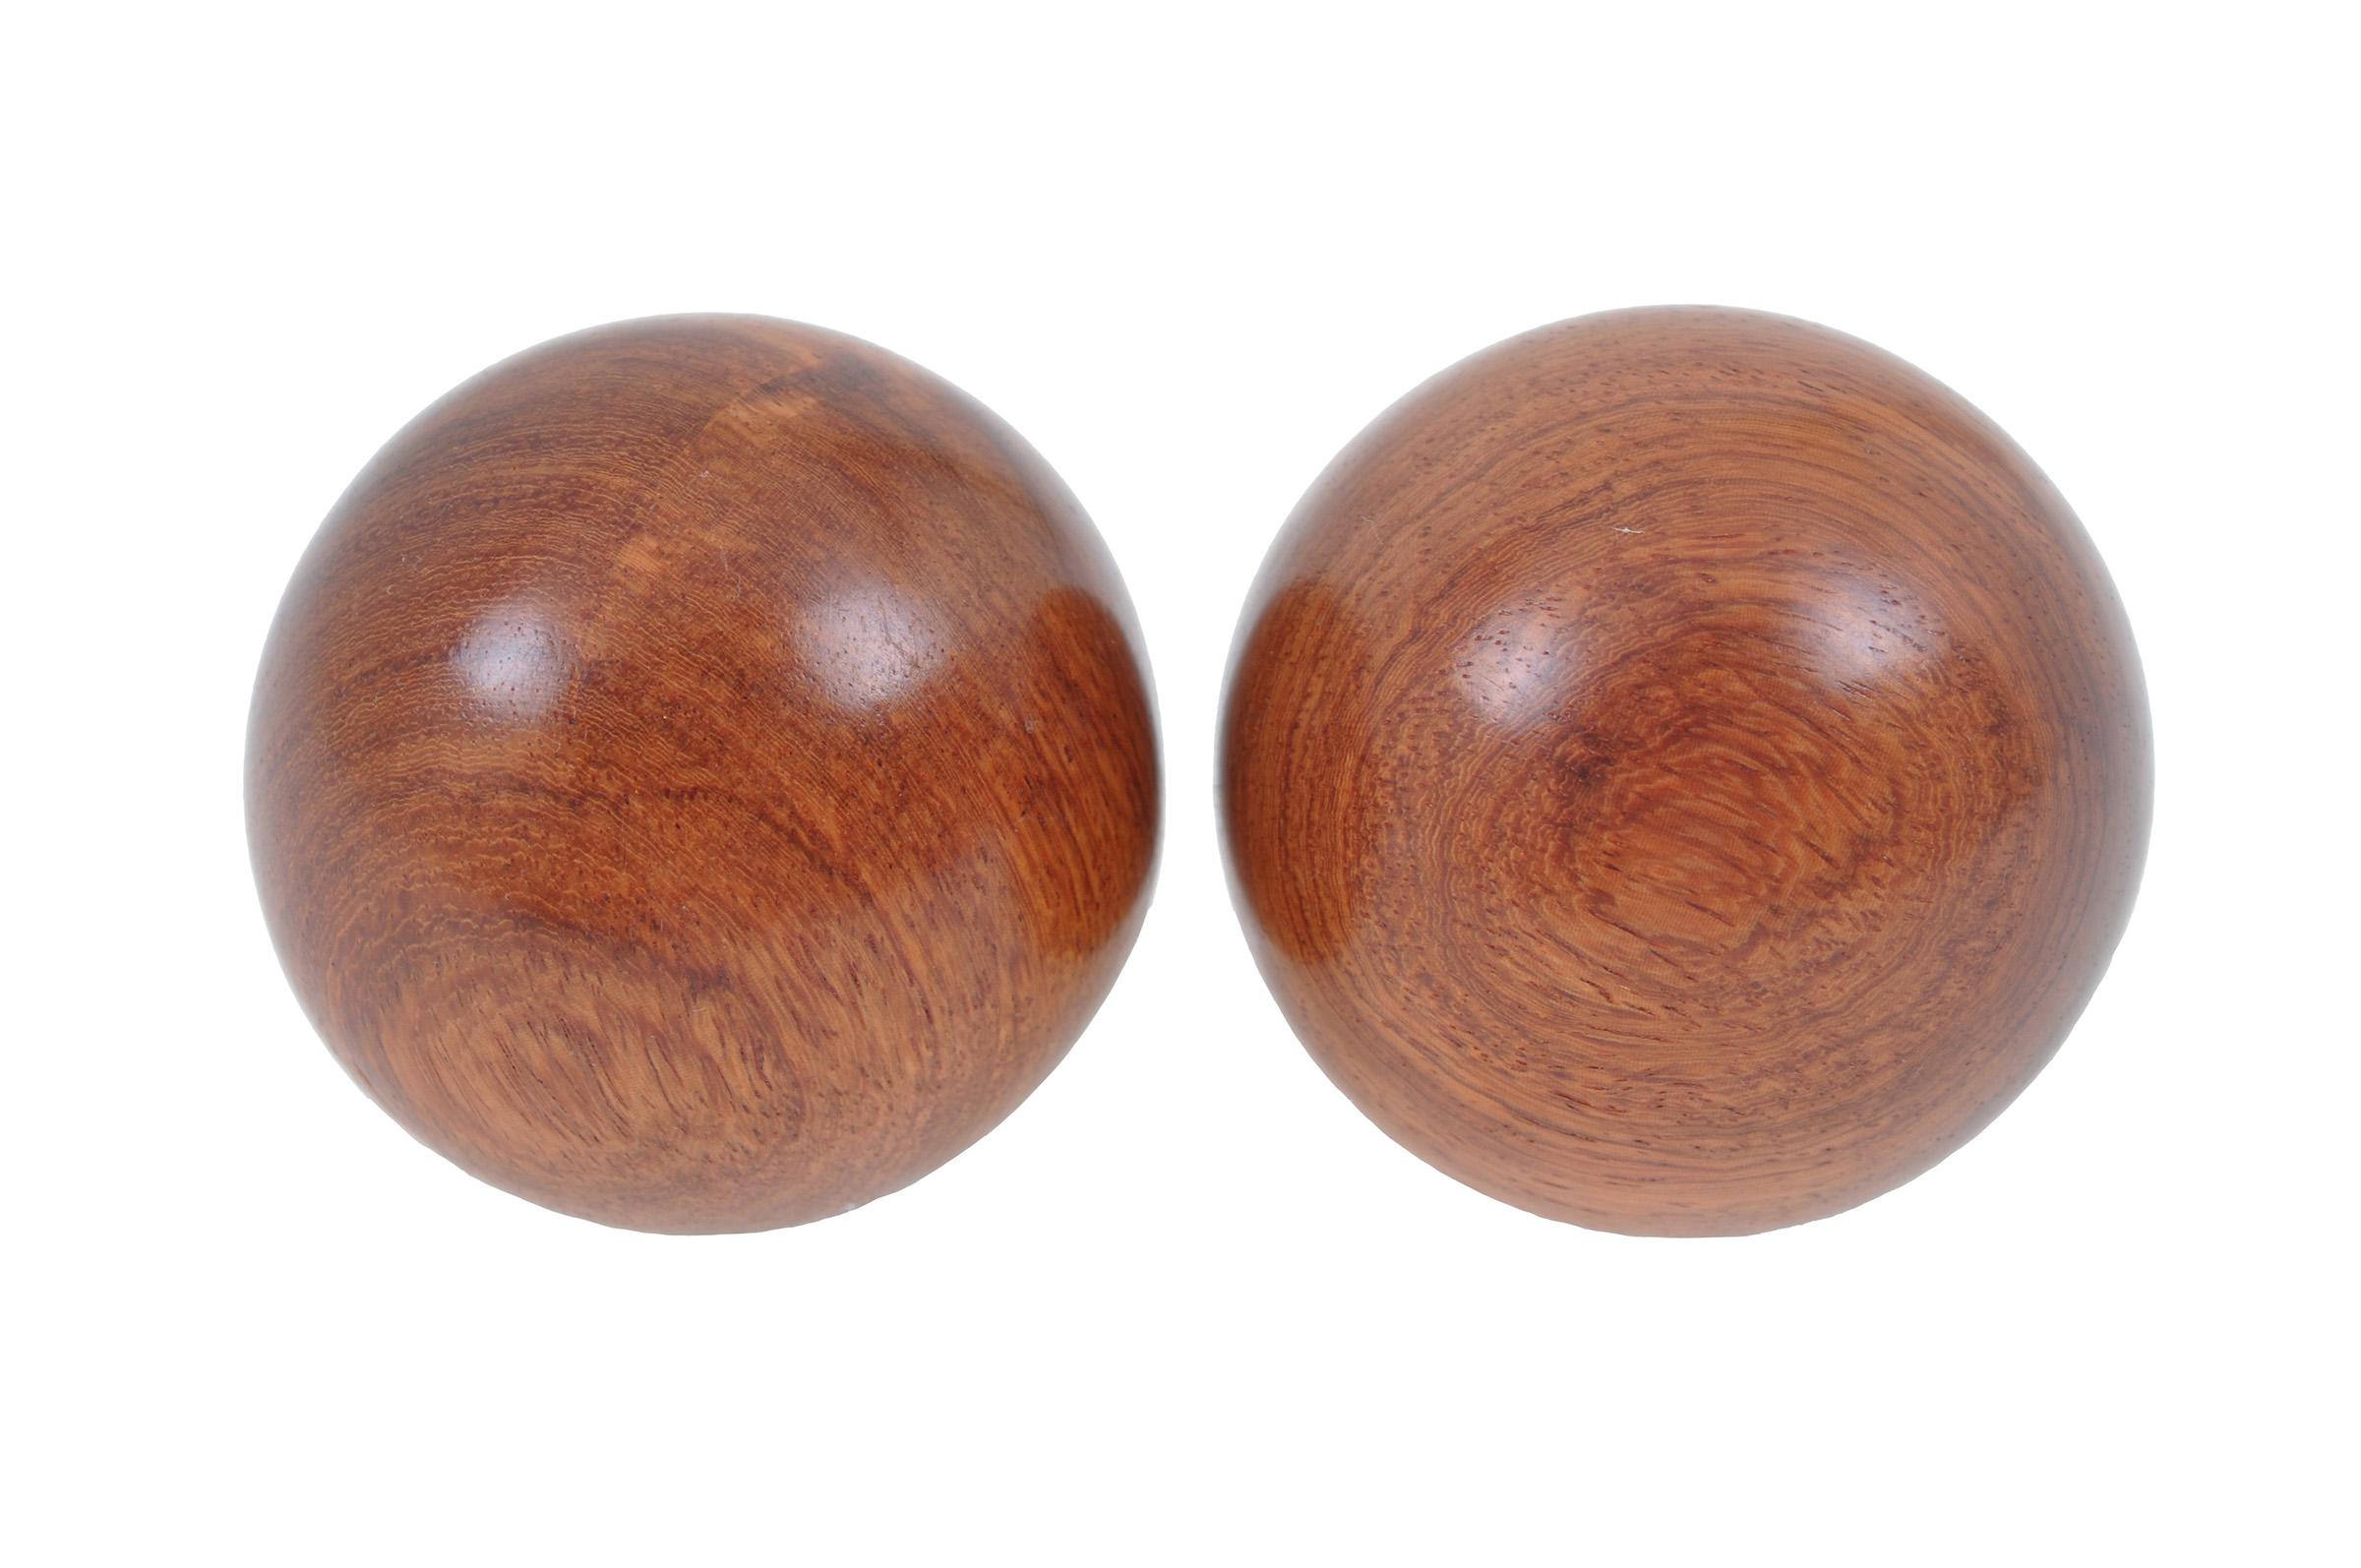 qi gong balls wood. Black Bedroom Furniture Sets. Home Design Ideas